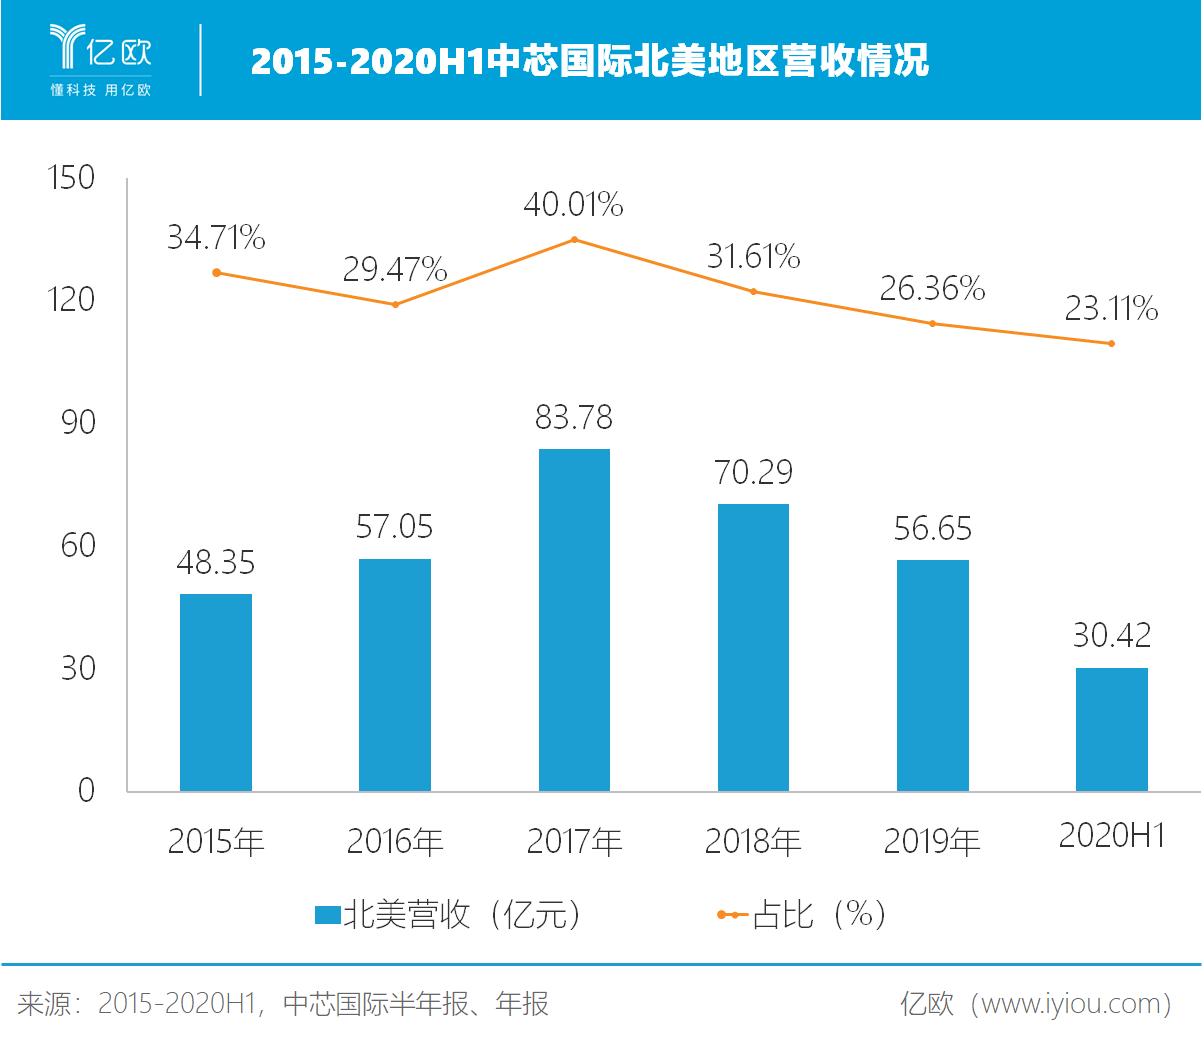 2015-2020H1中芯国际北美地区营收情况